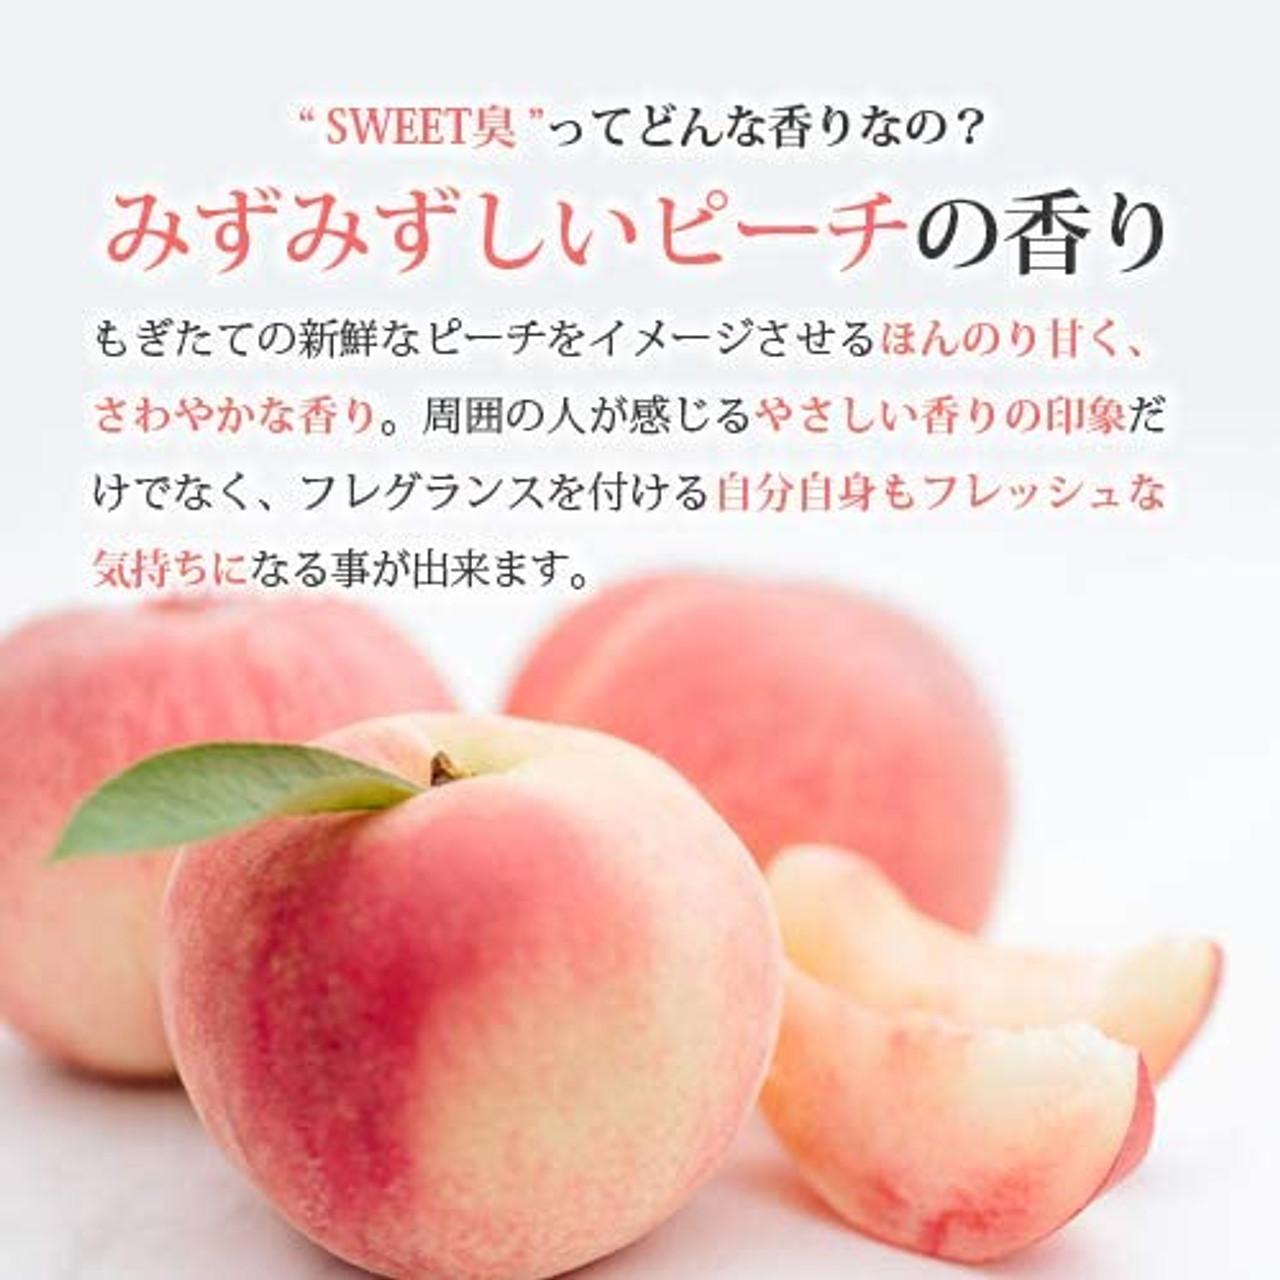 Mama Sango Sweet Lactone Fragrance Mist – мист для тела и волос с ароматом лактона